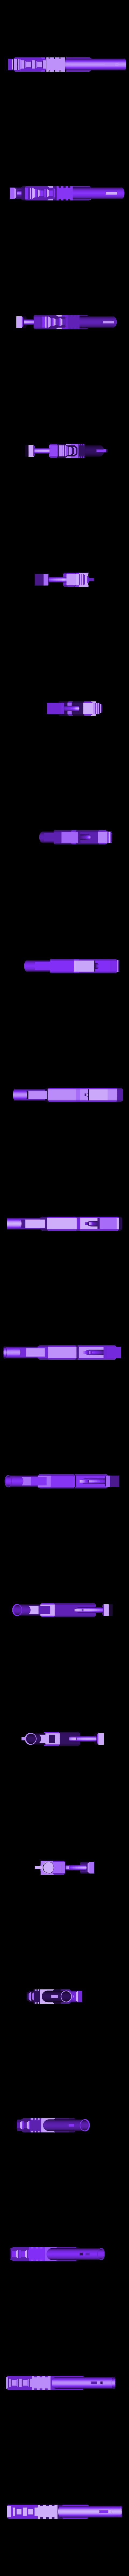 ArcadeMFGunAscii.stl Download STL file Arcade Miss Fortune Gun • 3D printer model, Laramaine